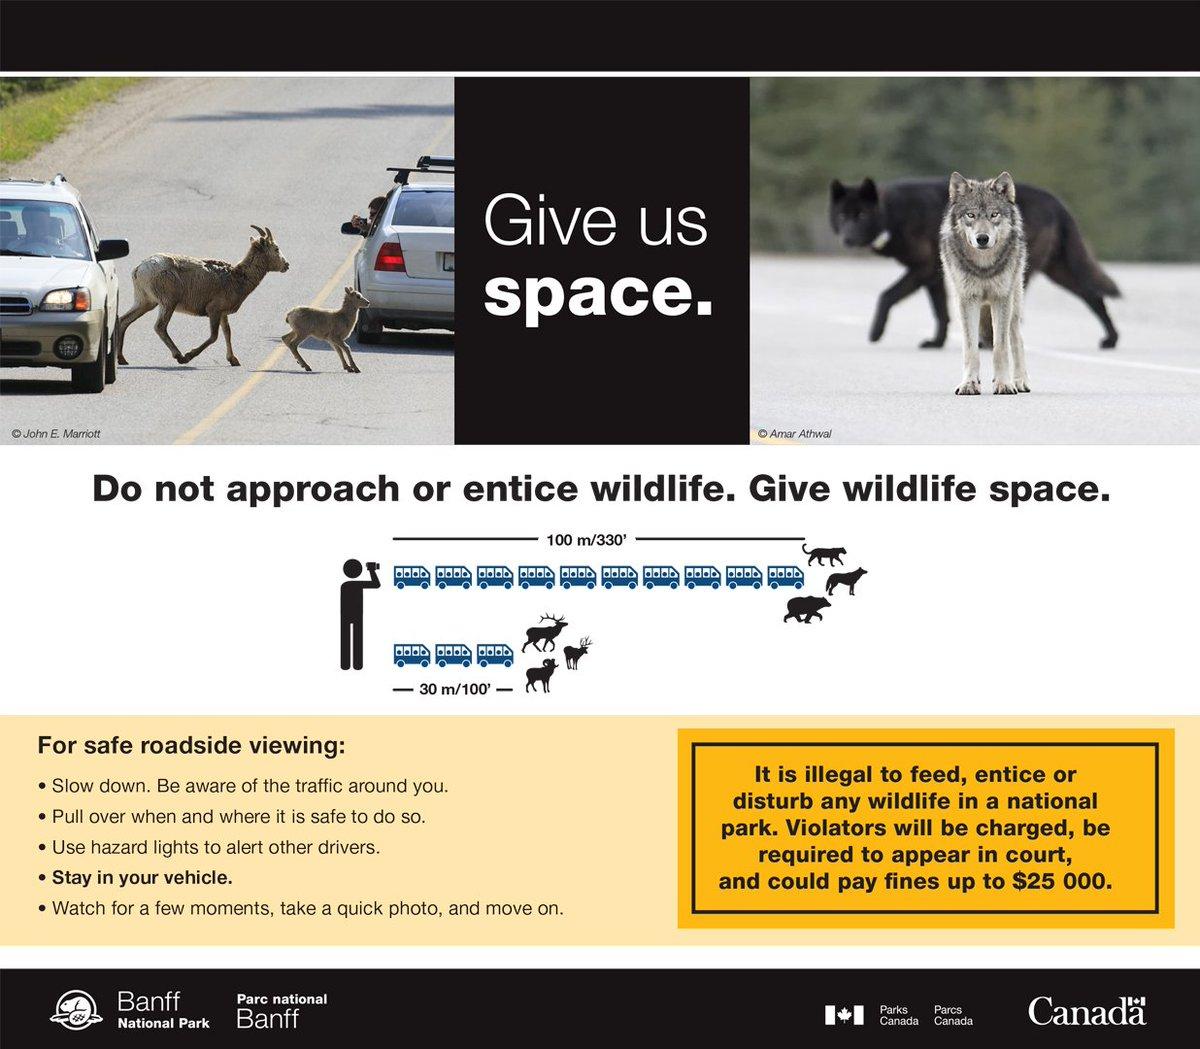 Help keep them wild. Do not approach or entice wildlife. #KeepWildlifeWild https://t.co/vwpqPLvxrw